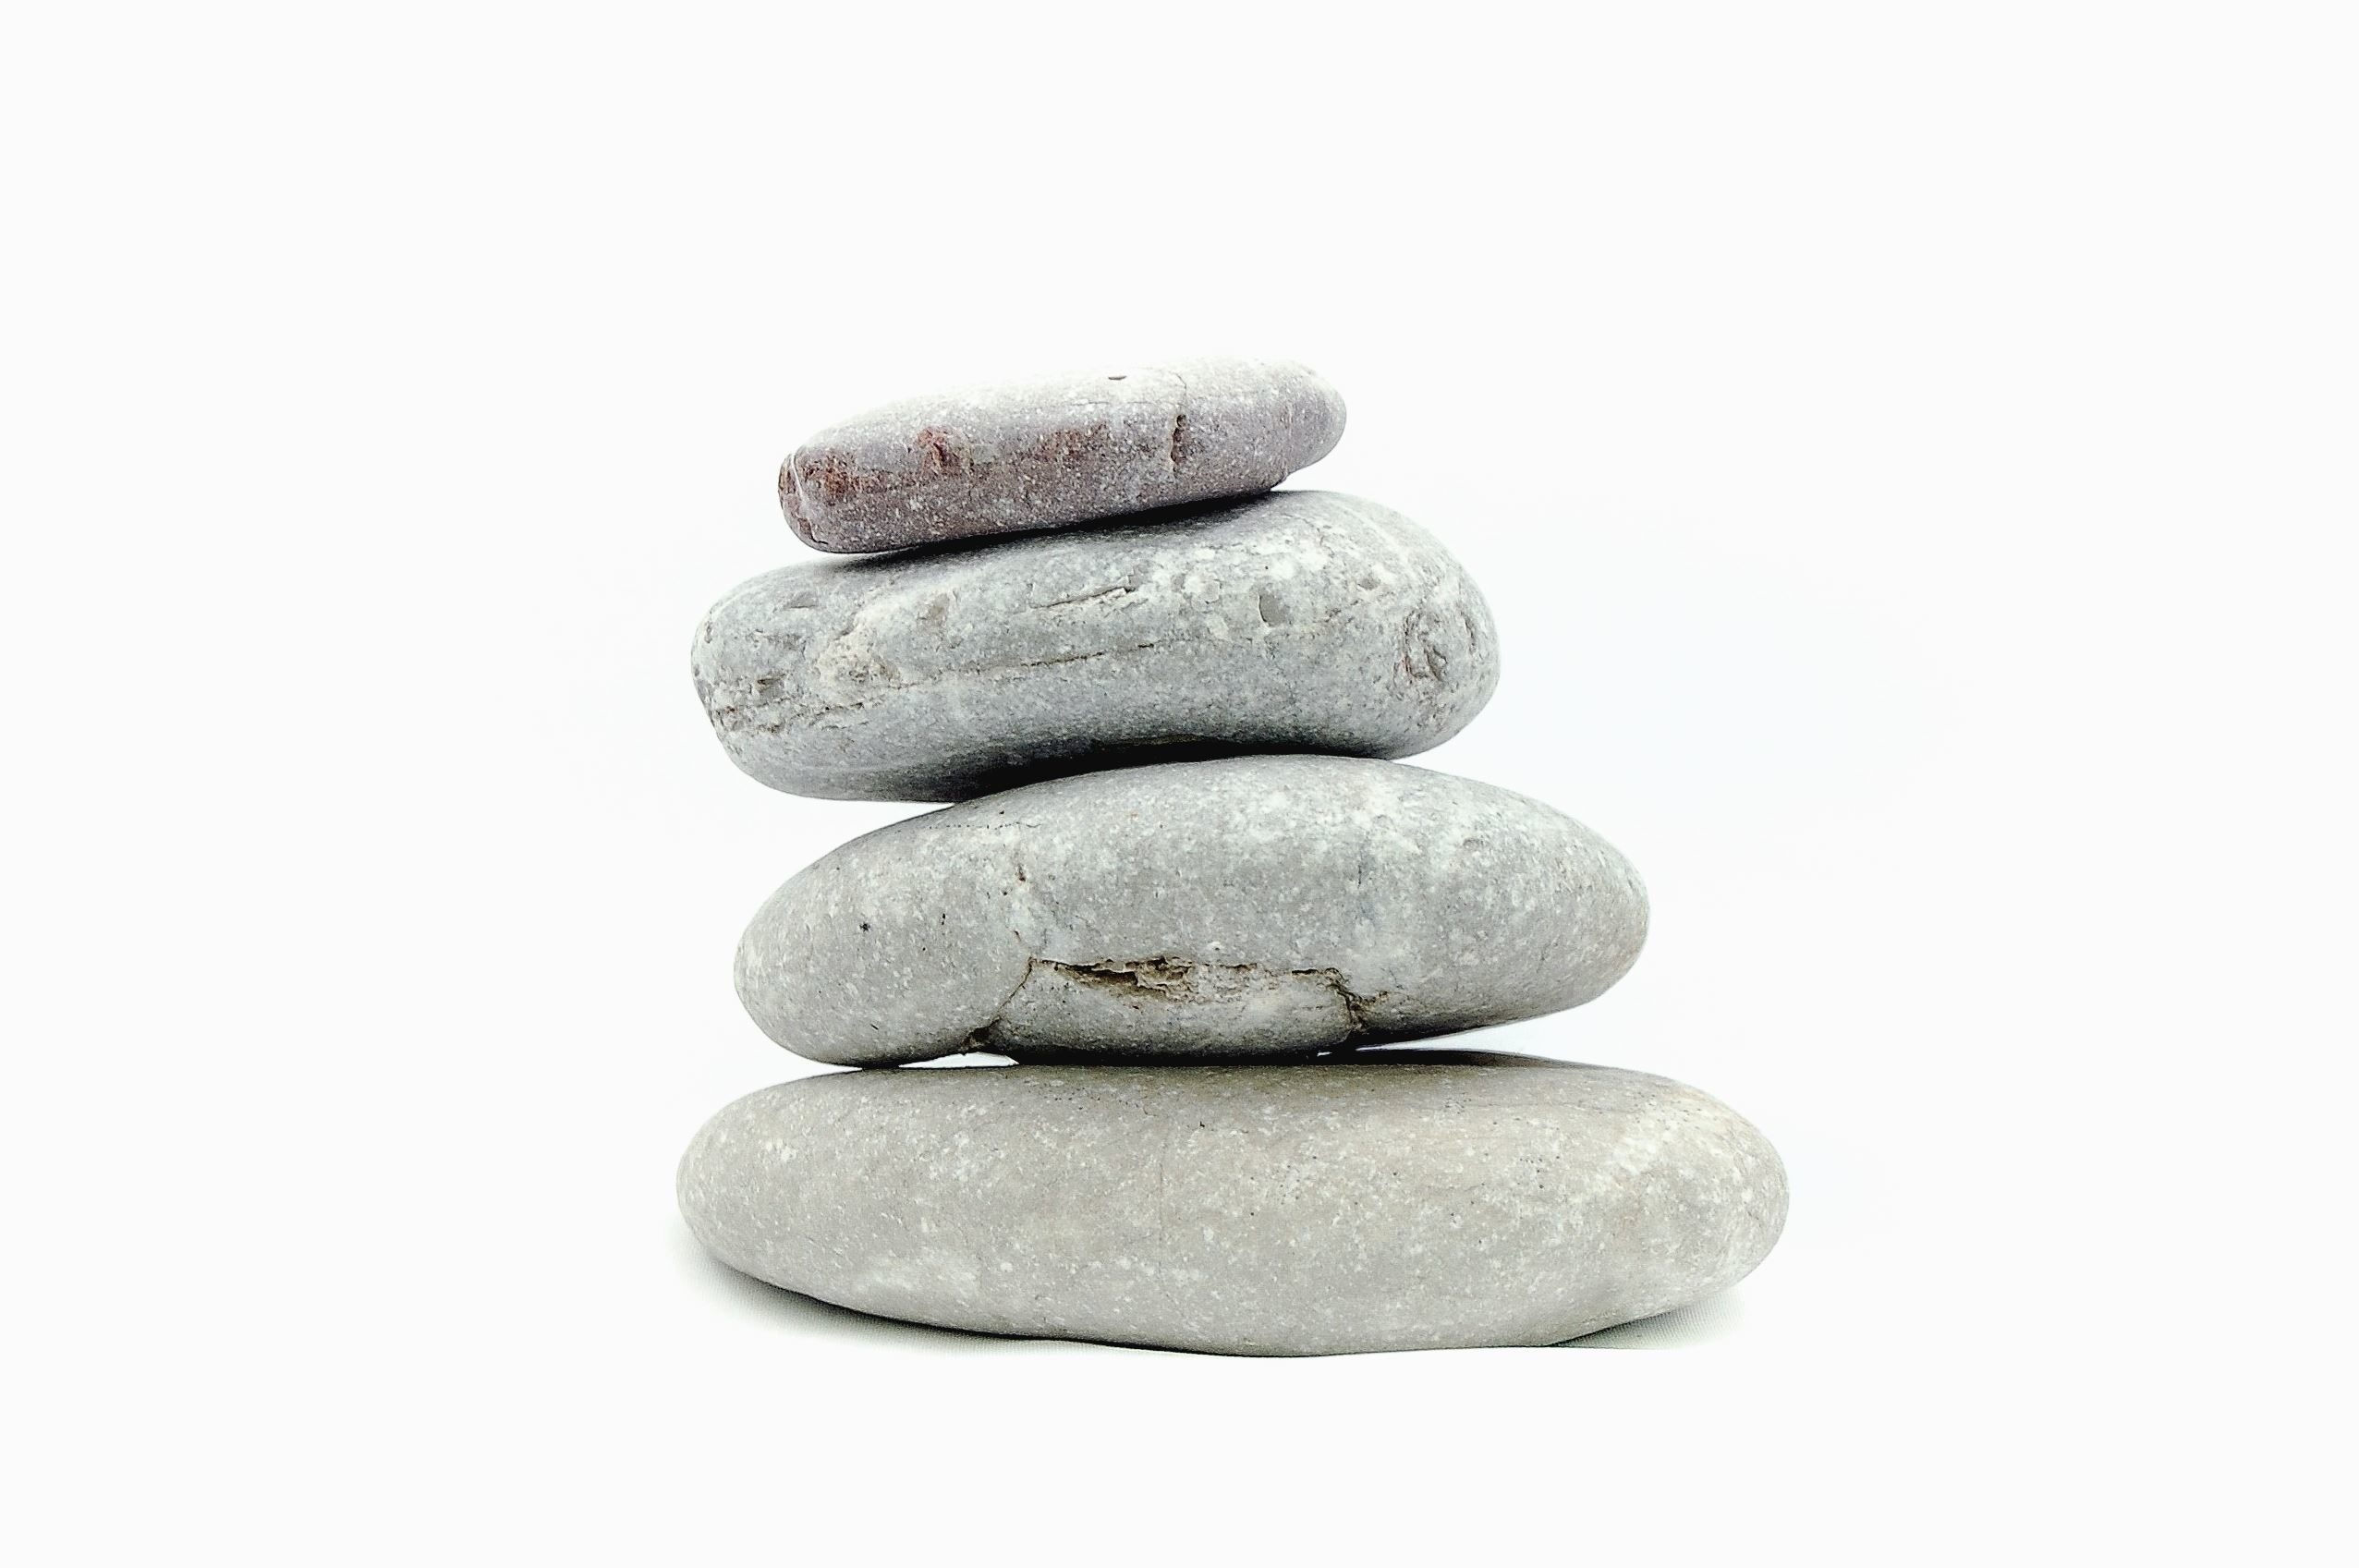 free picture balance rocks stones pebbles